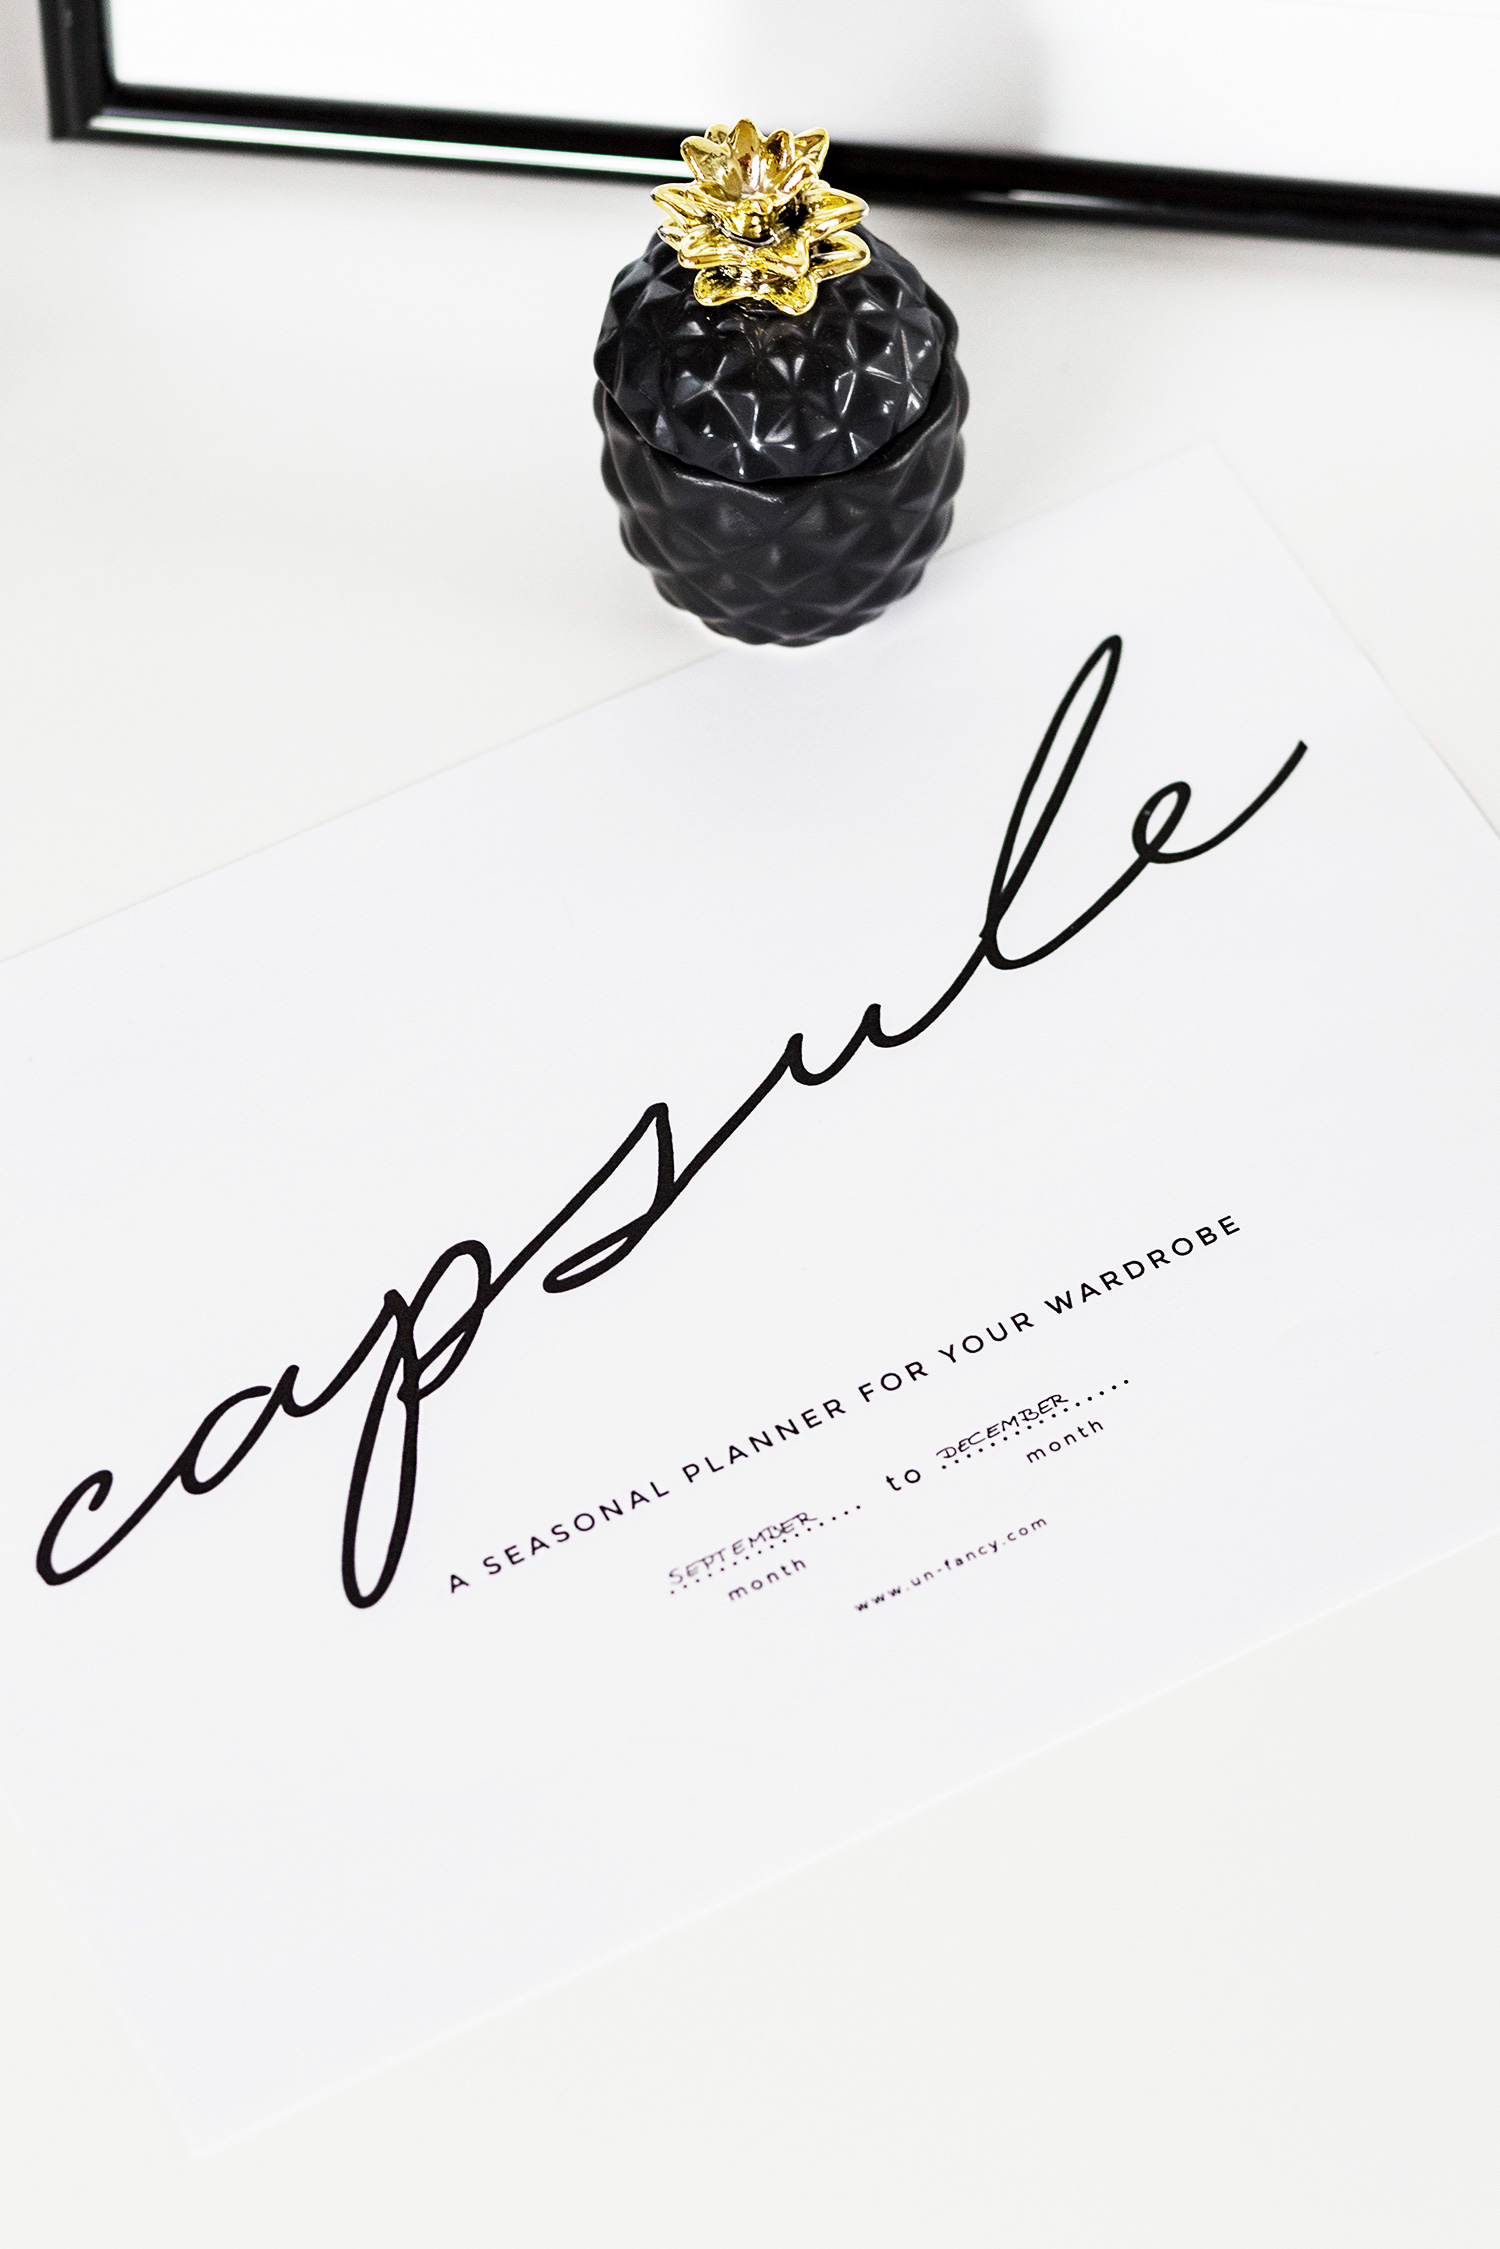 September Favoriten 2017, Monatsrückblick, Capsule Wardrobe Projekt, bezauberndenana.de